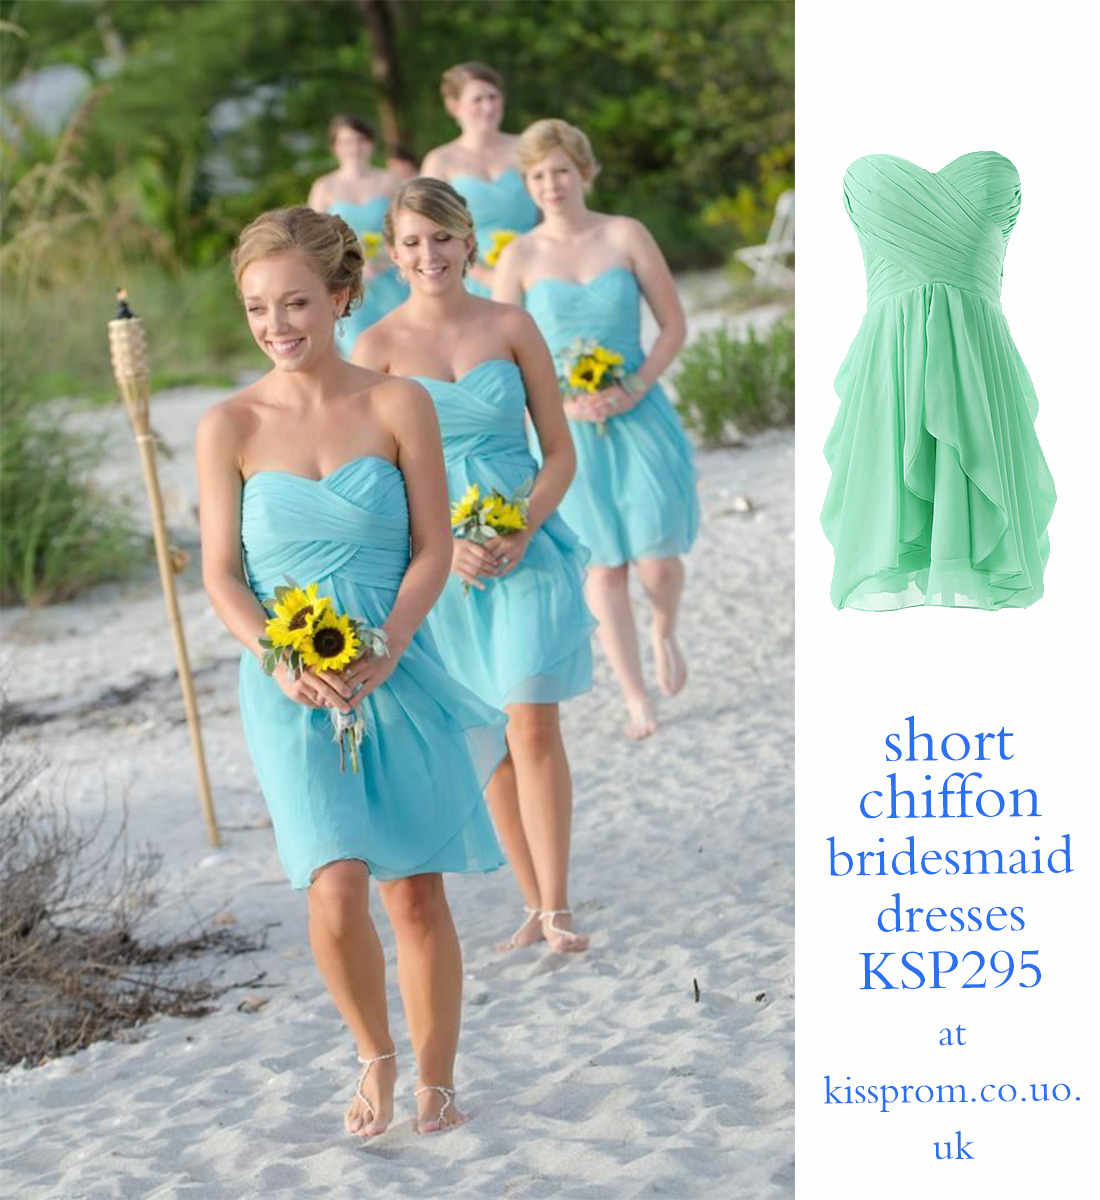 short bridesmaid dresses for beach wedding